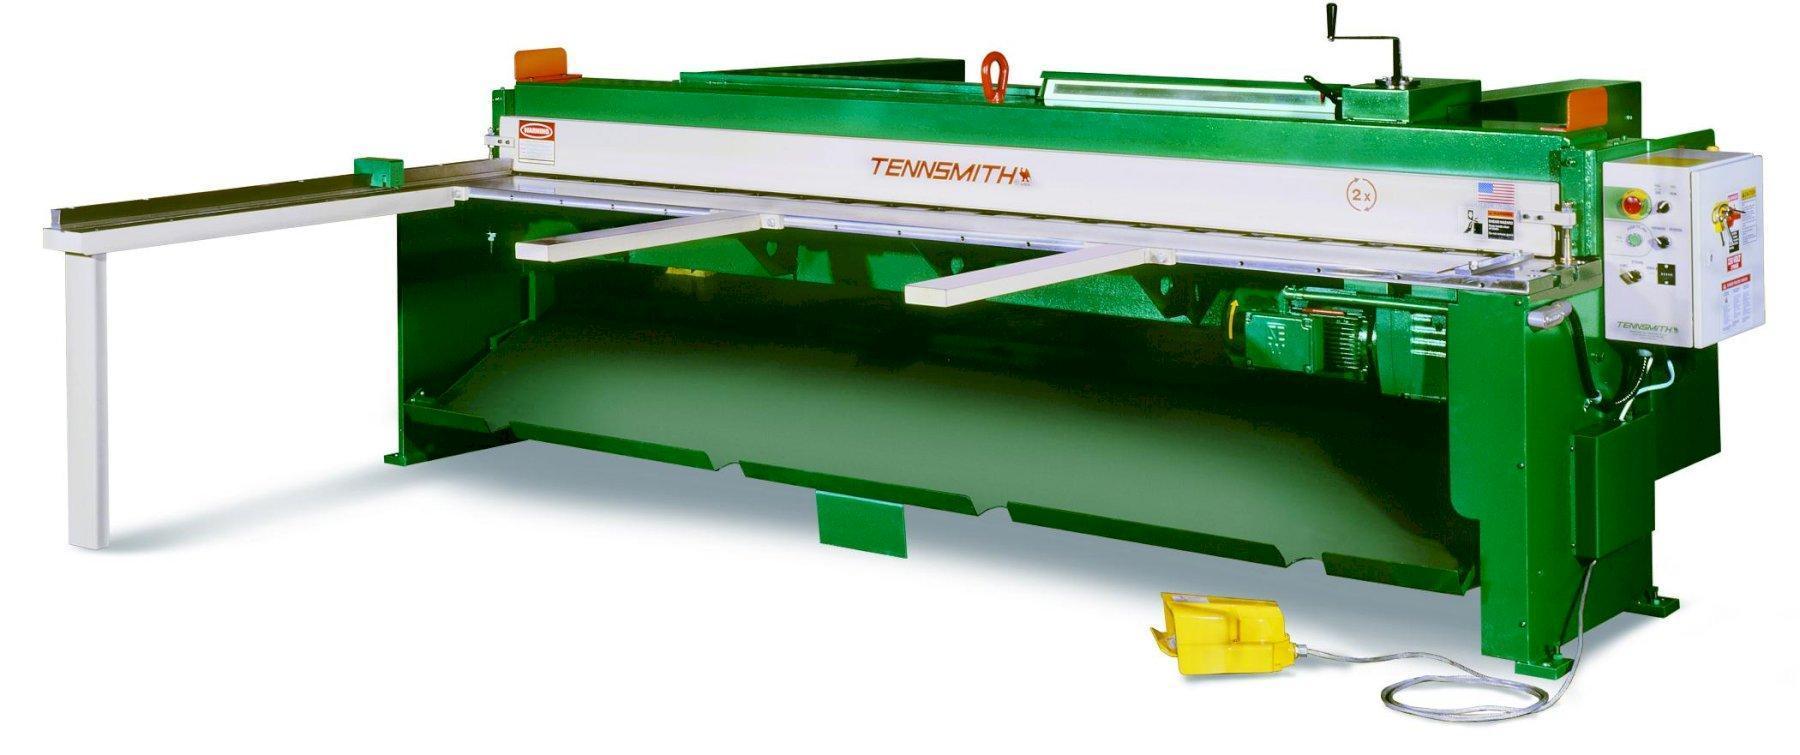 16 ga x 10 ft New Tennsmith Mechanical Power Shear Model MSE-1016R